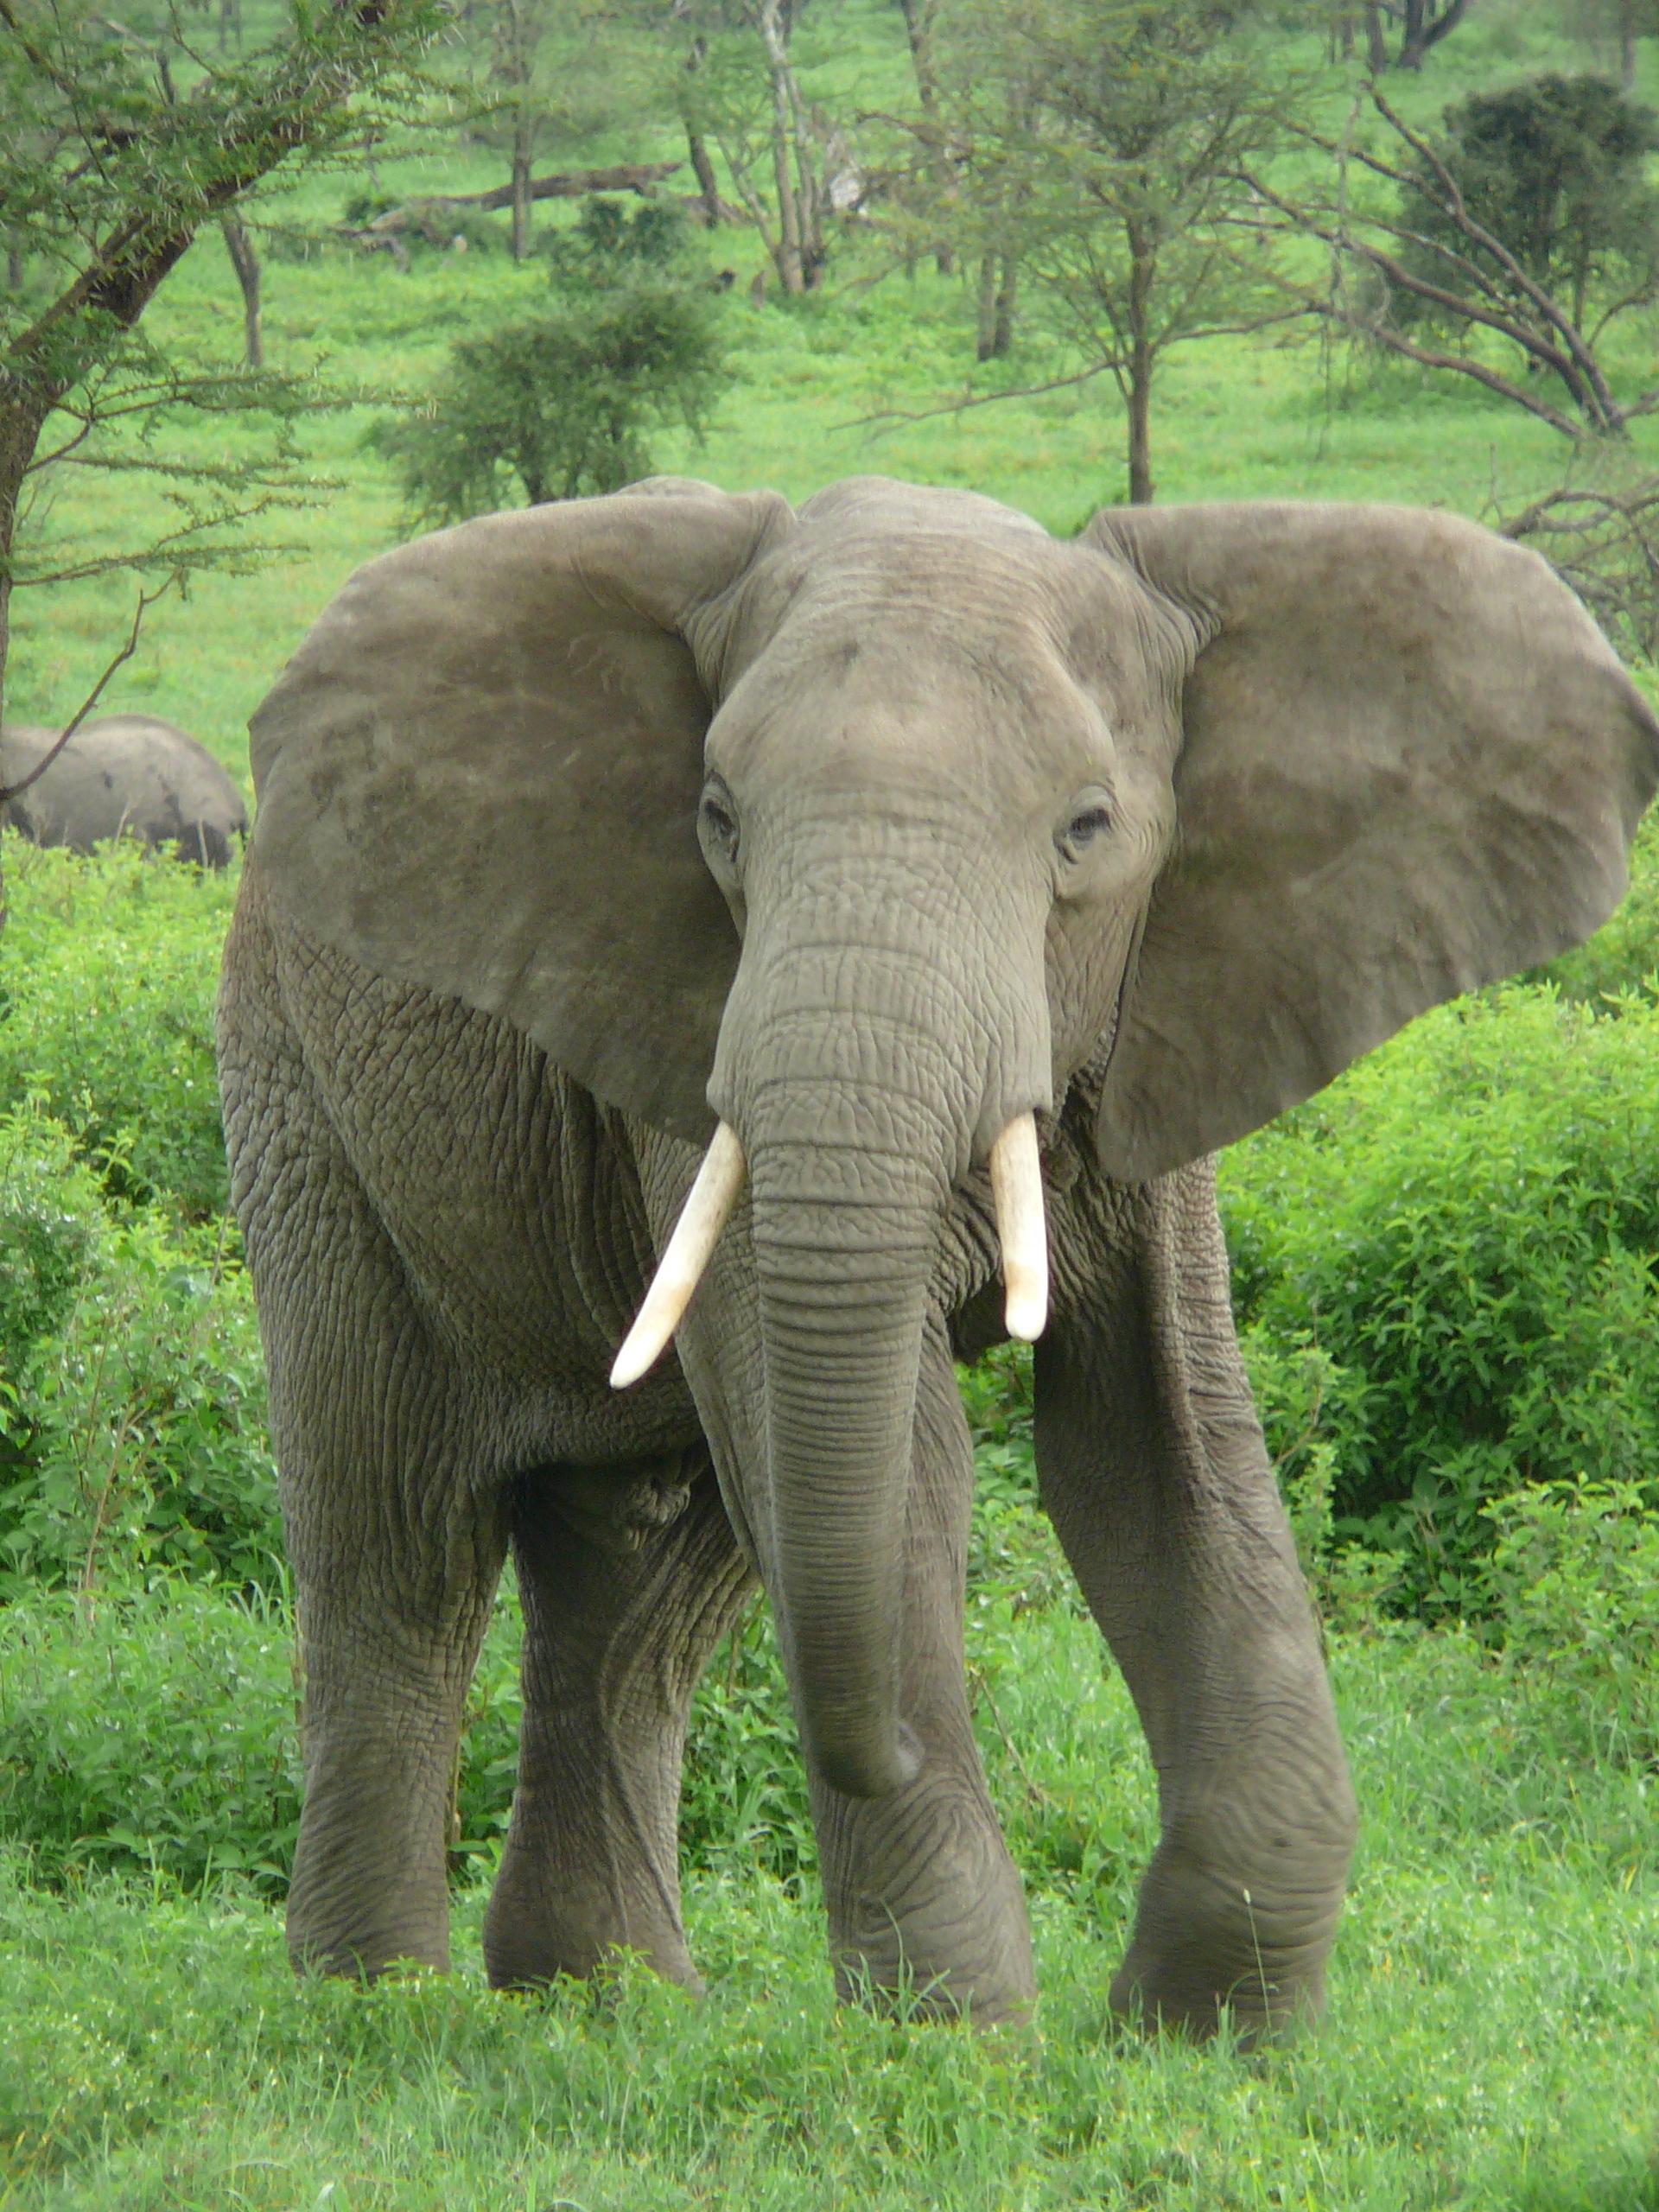 elephant animals fanpop animal elephants wildlife elefante near sa species many wikipedia ivoire cote